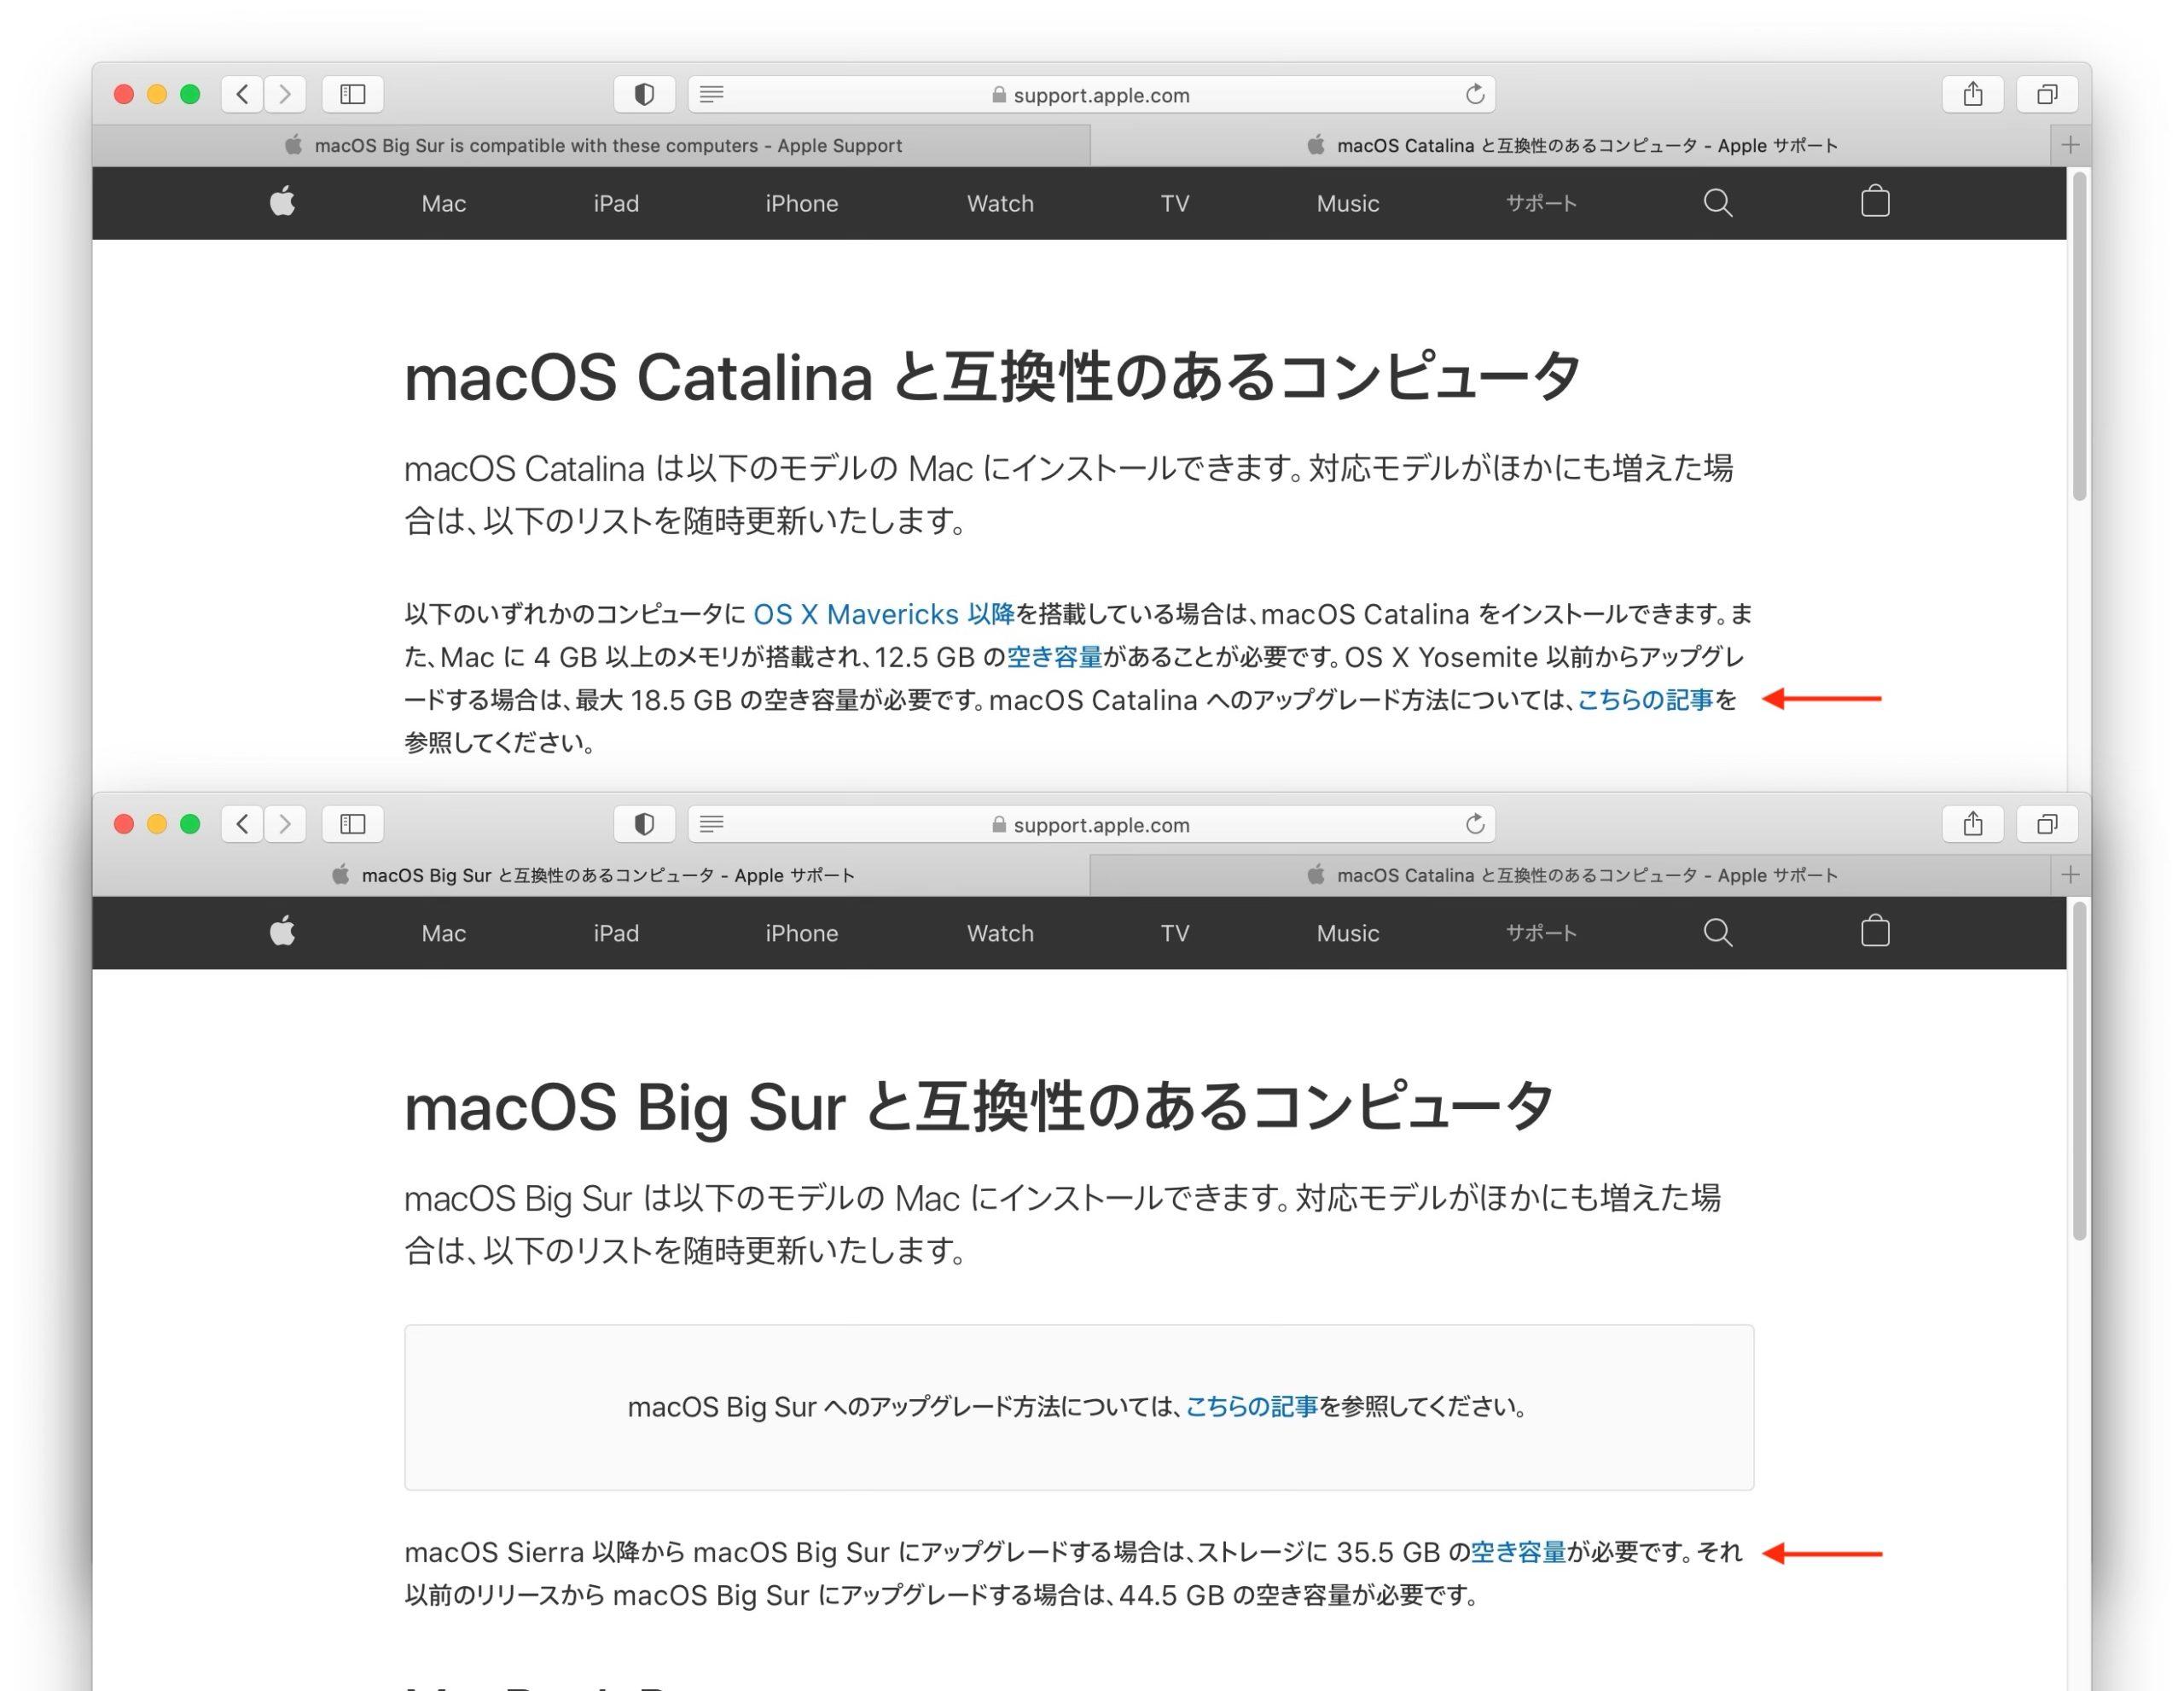 macOS 10.15 CatalinaとmacOS 11 Big Surへアップグレードするために必要なストレージ容量